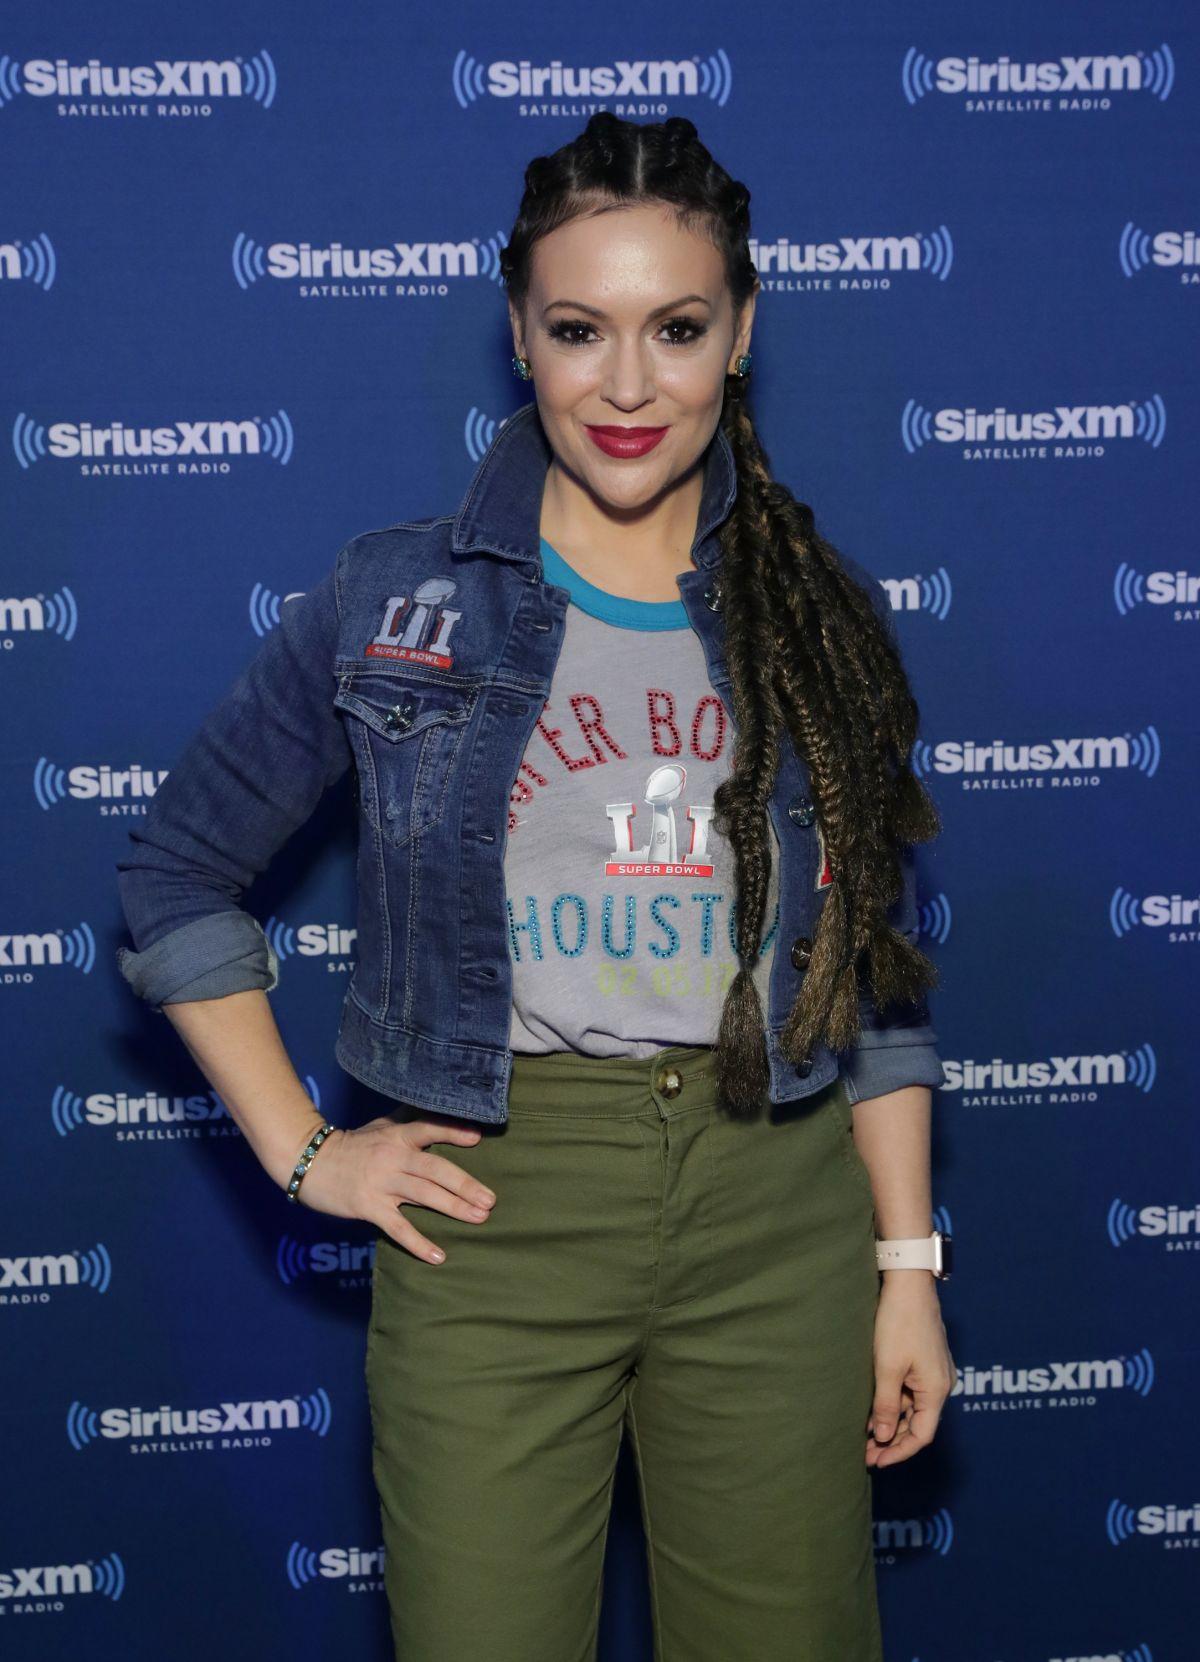 ALYSSA MILANO at SiriusXM at Super Bowl LI Radio Row in Houston 02/03/2017